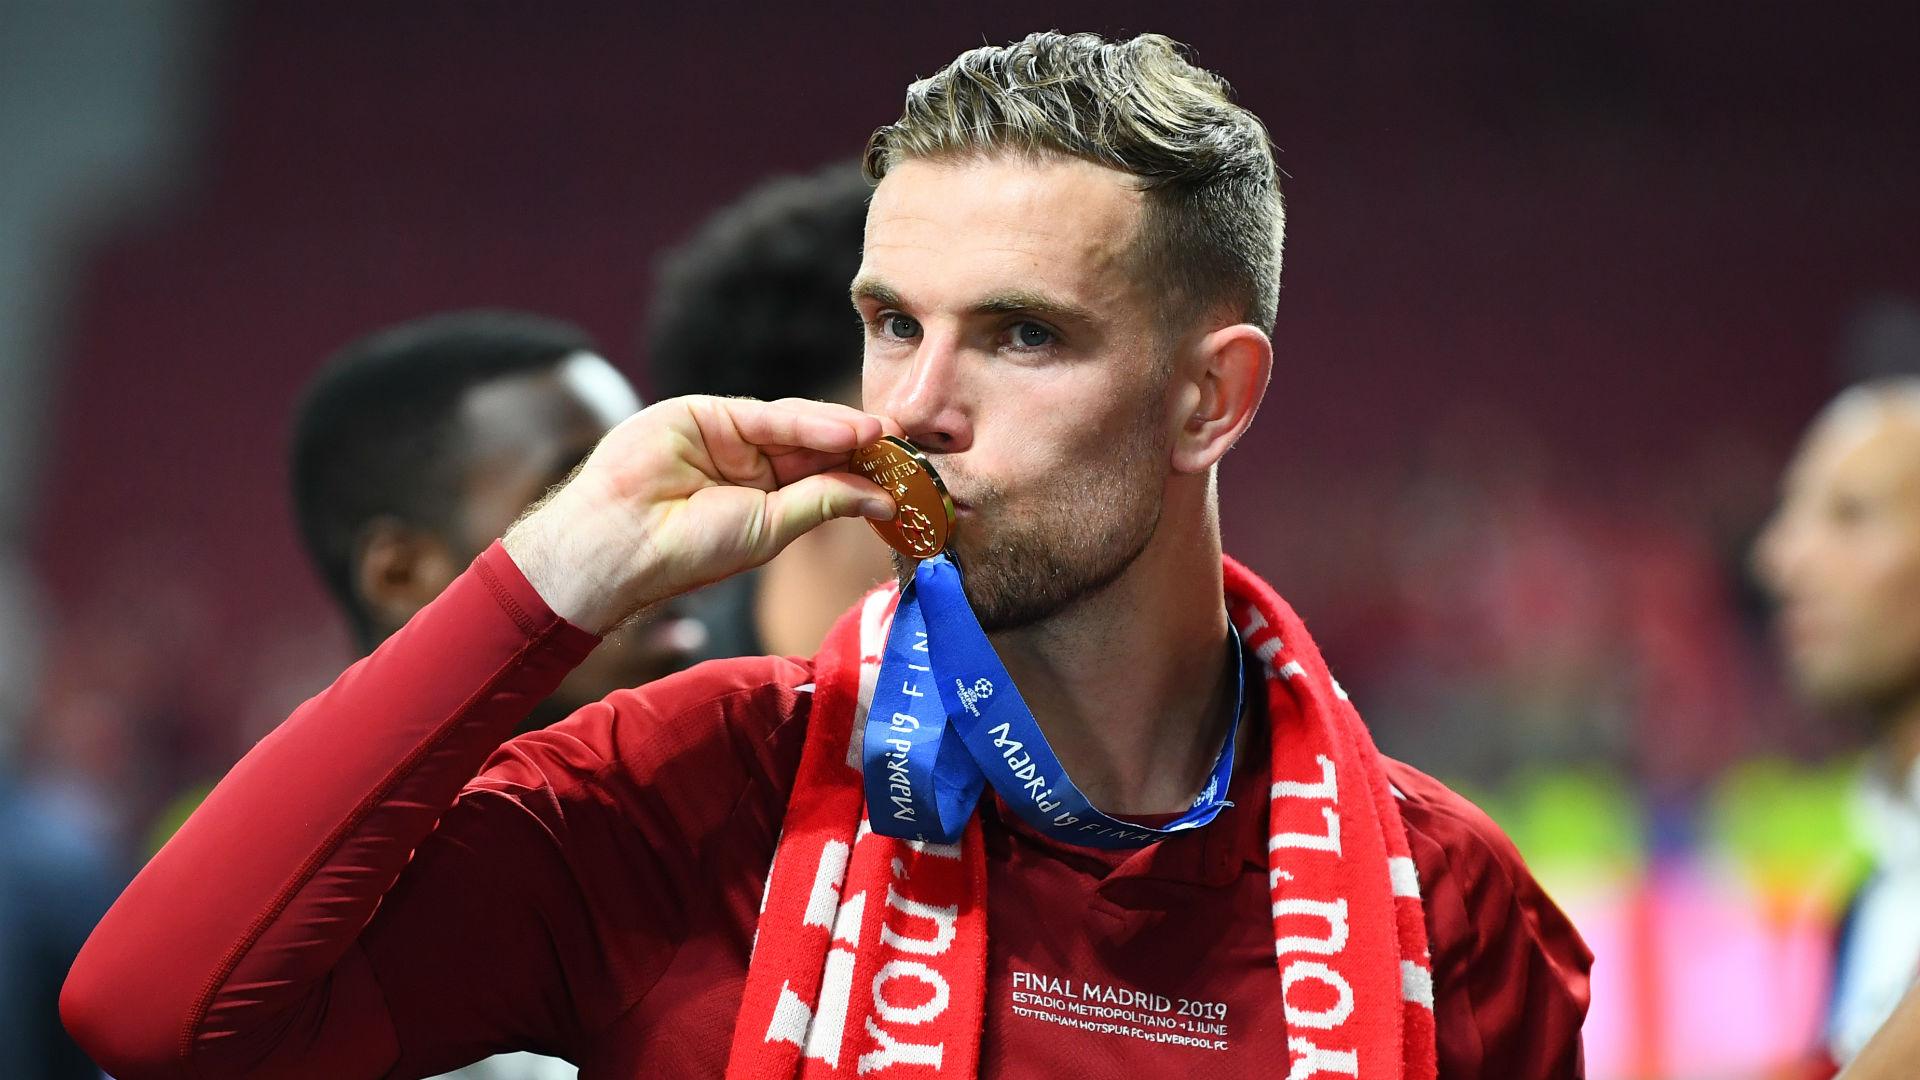 Berita Liverpool Virgil Van Dijk Jordan Henderson Panutan Sempurna Goal Com